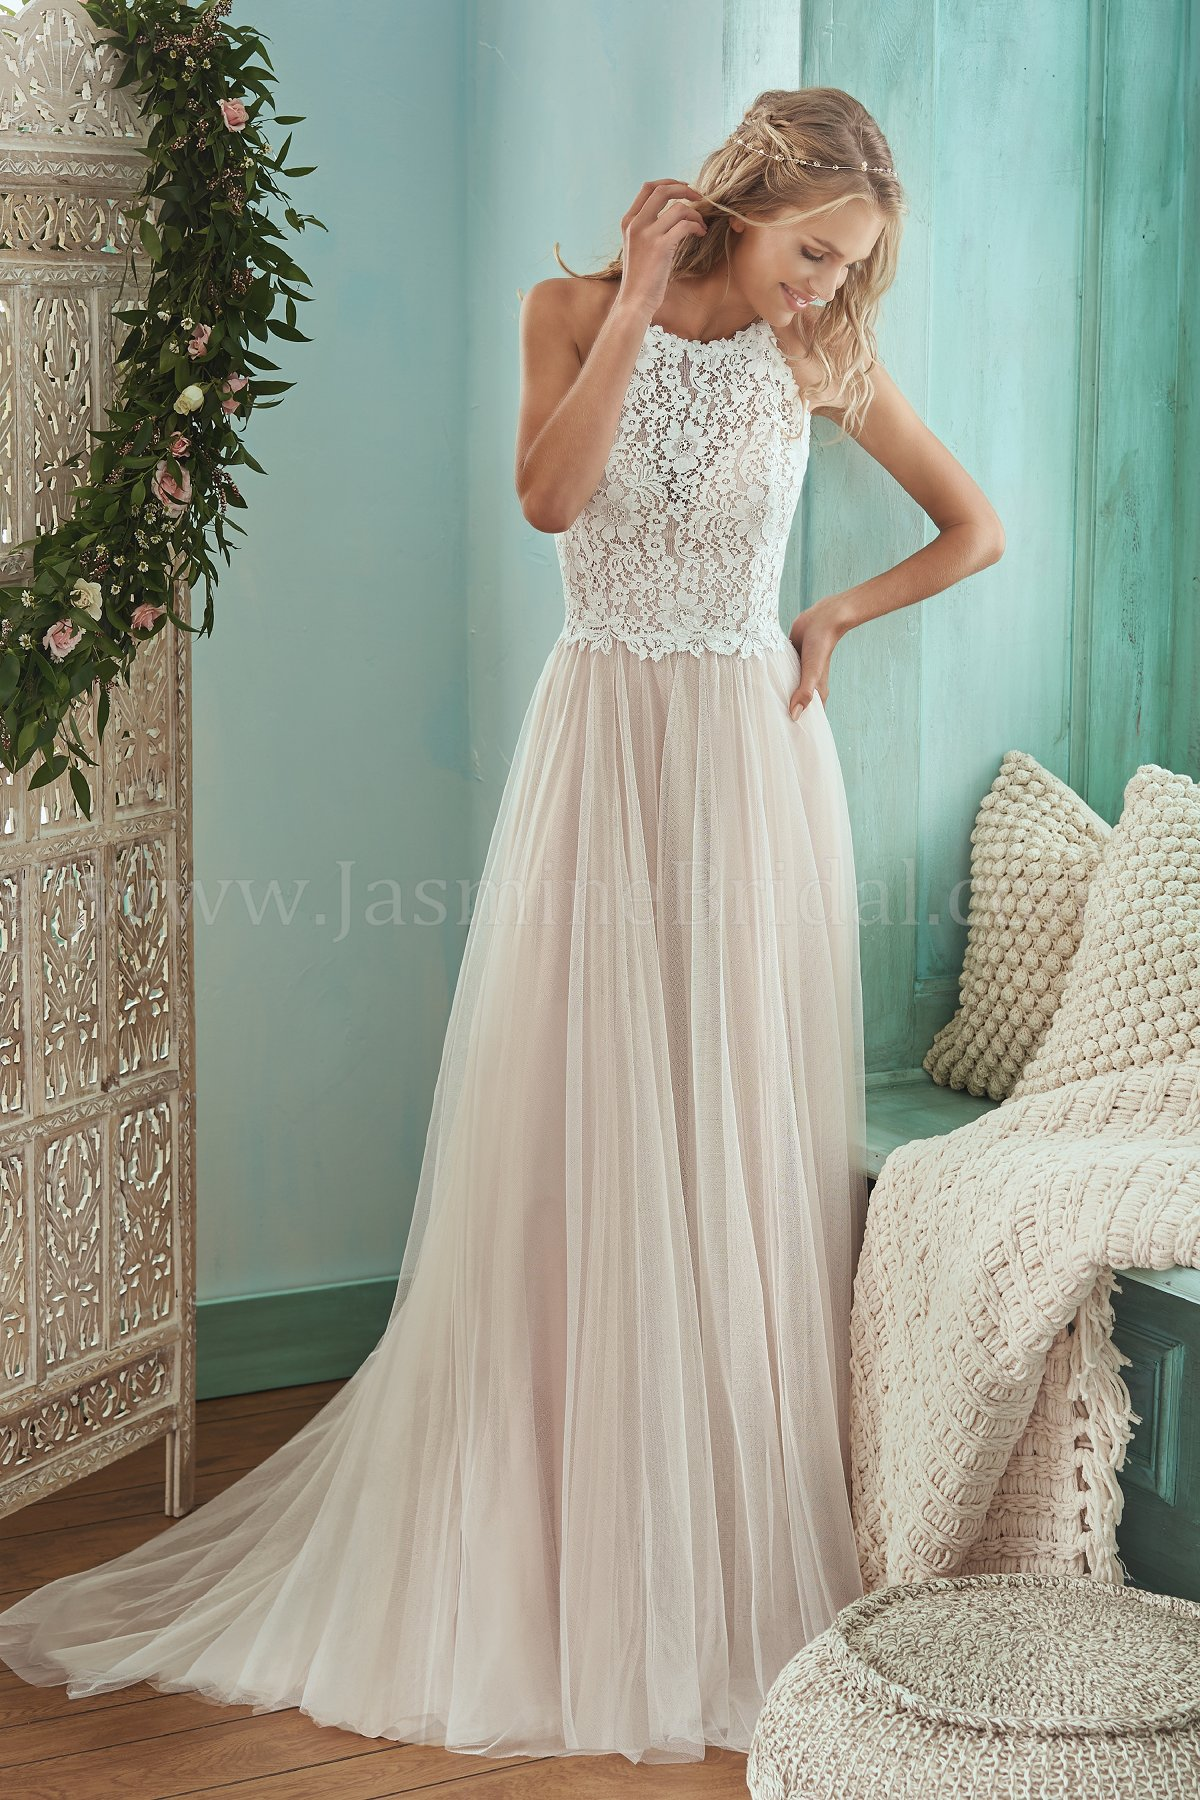 Beach Wedding Dresses-Lightweight, airy and romantic dresses-Jasmine ...